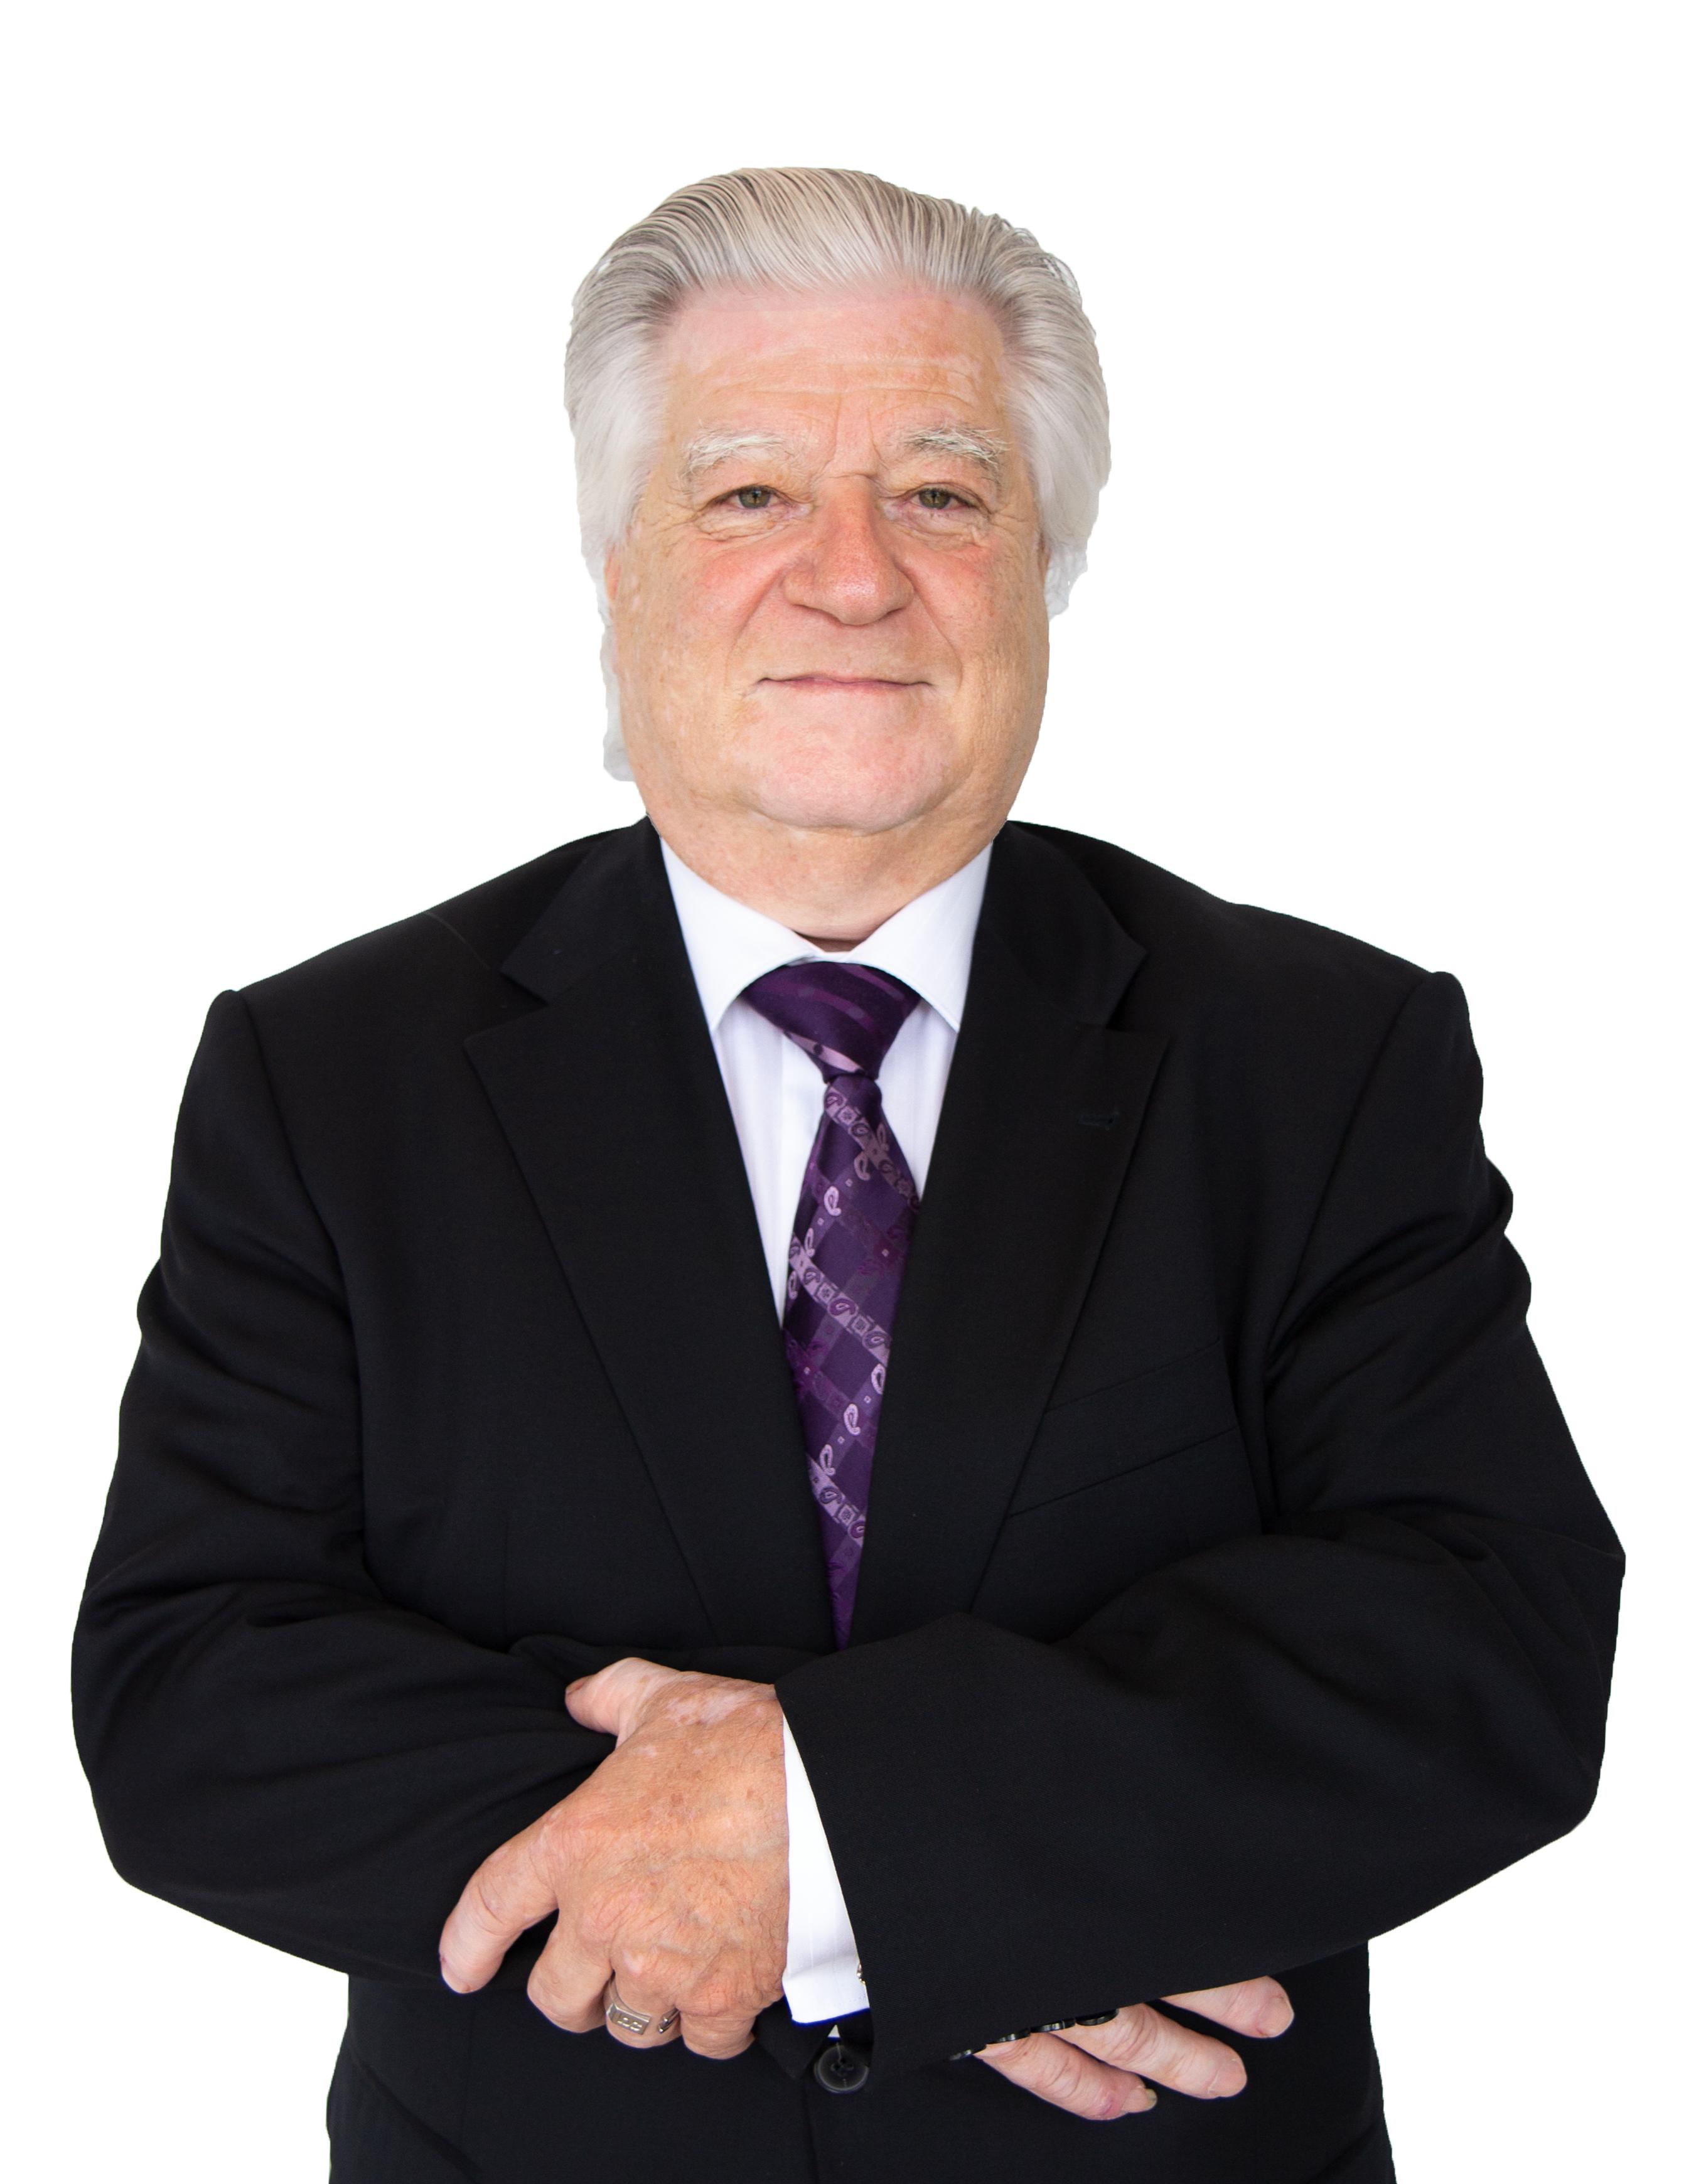 Jean Robichaud